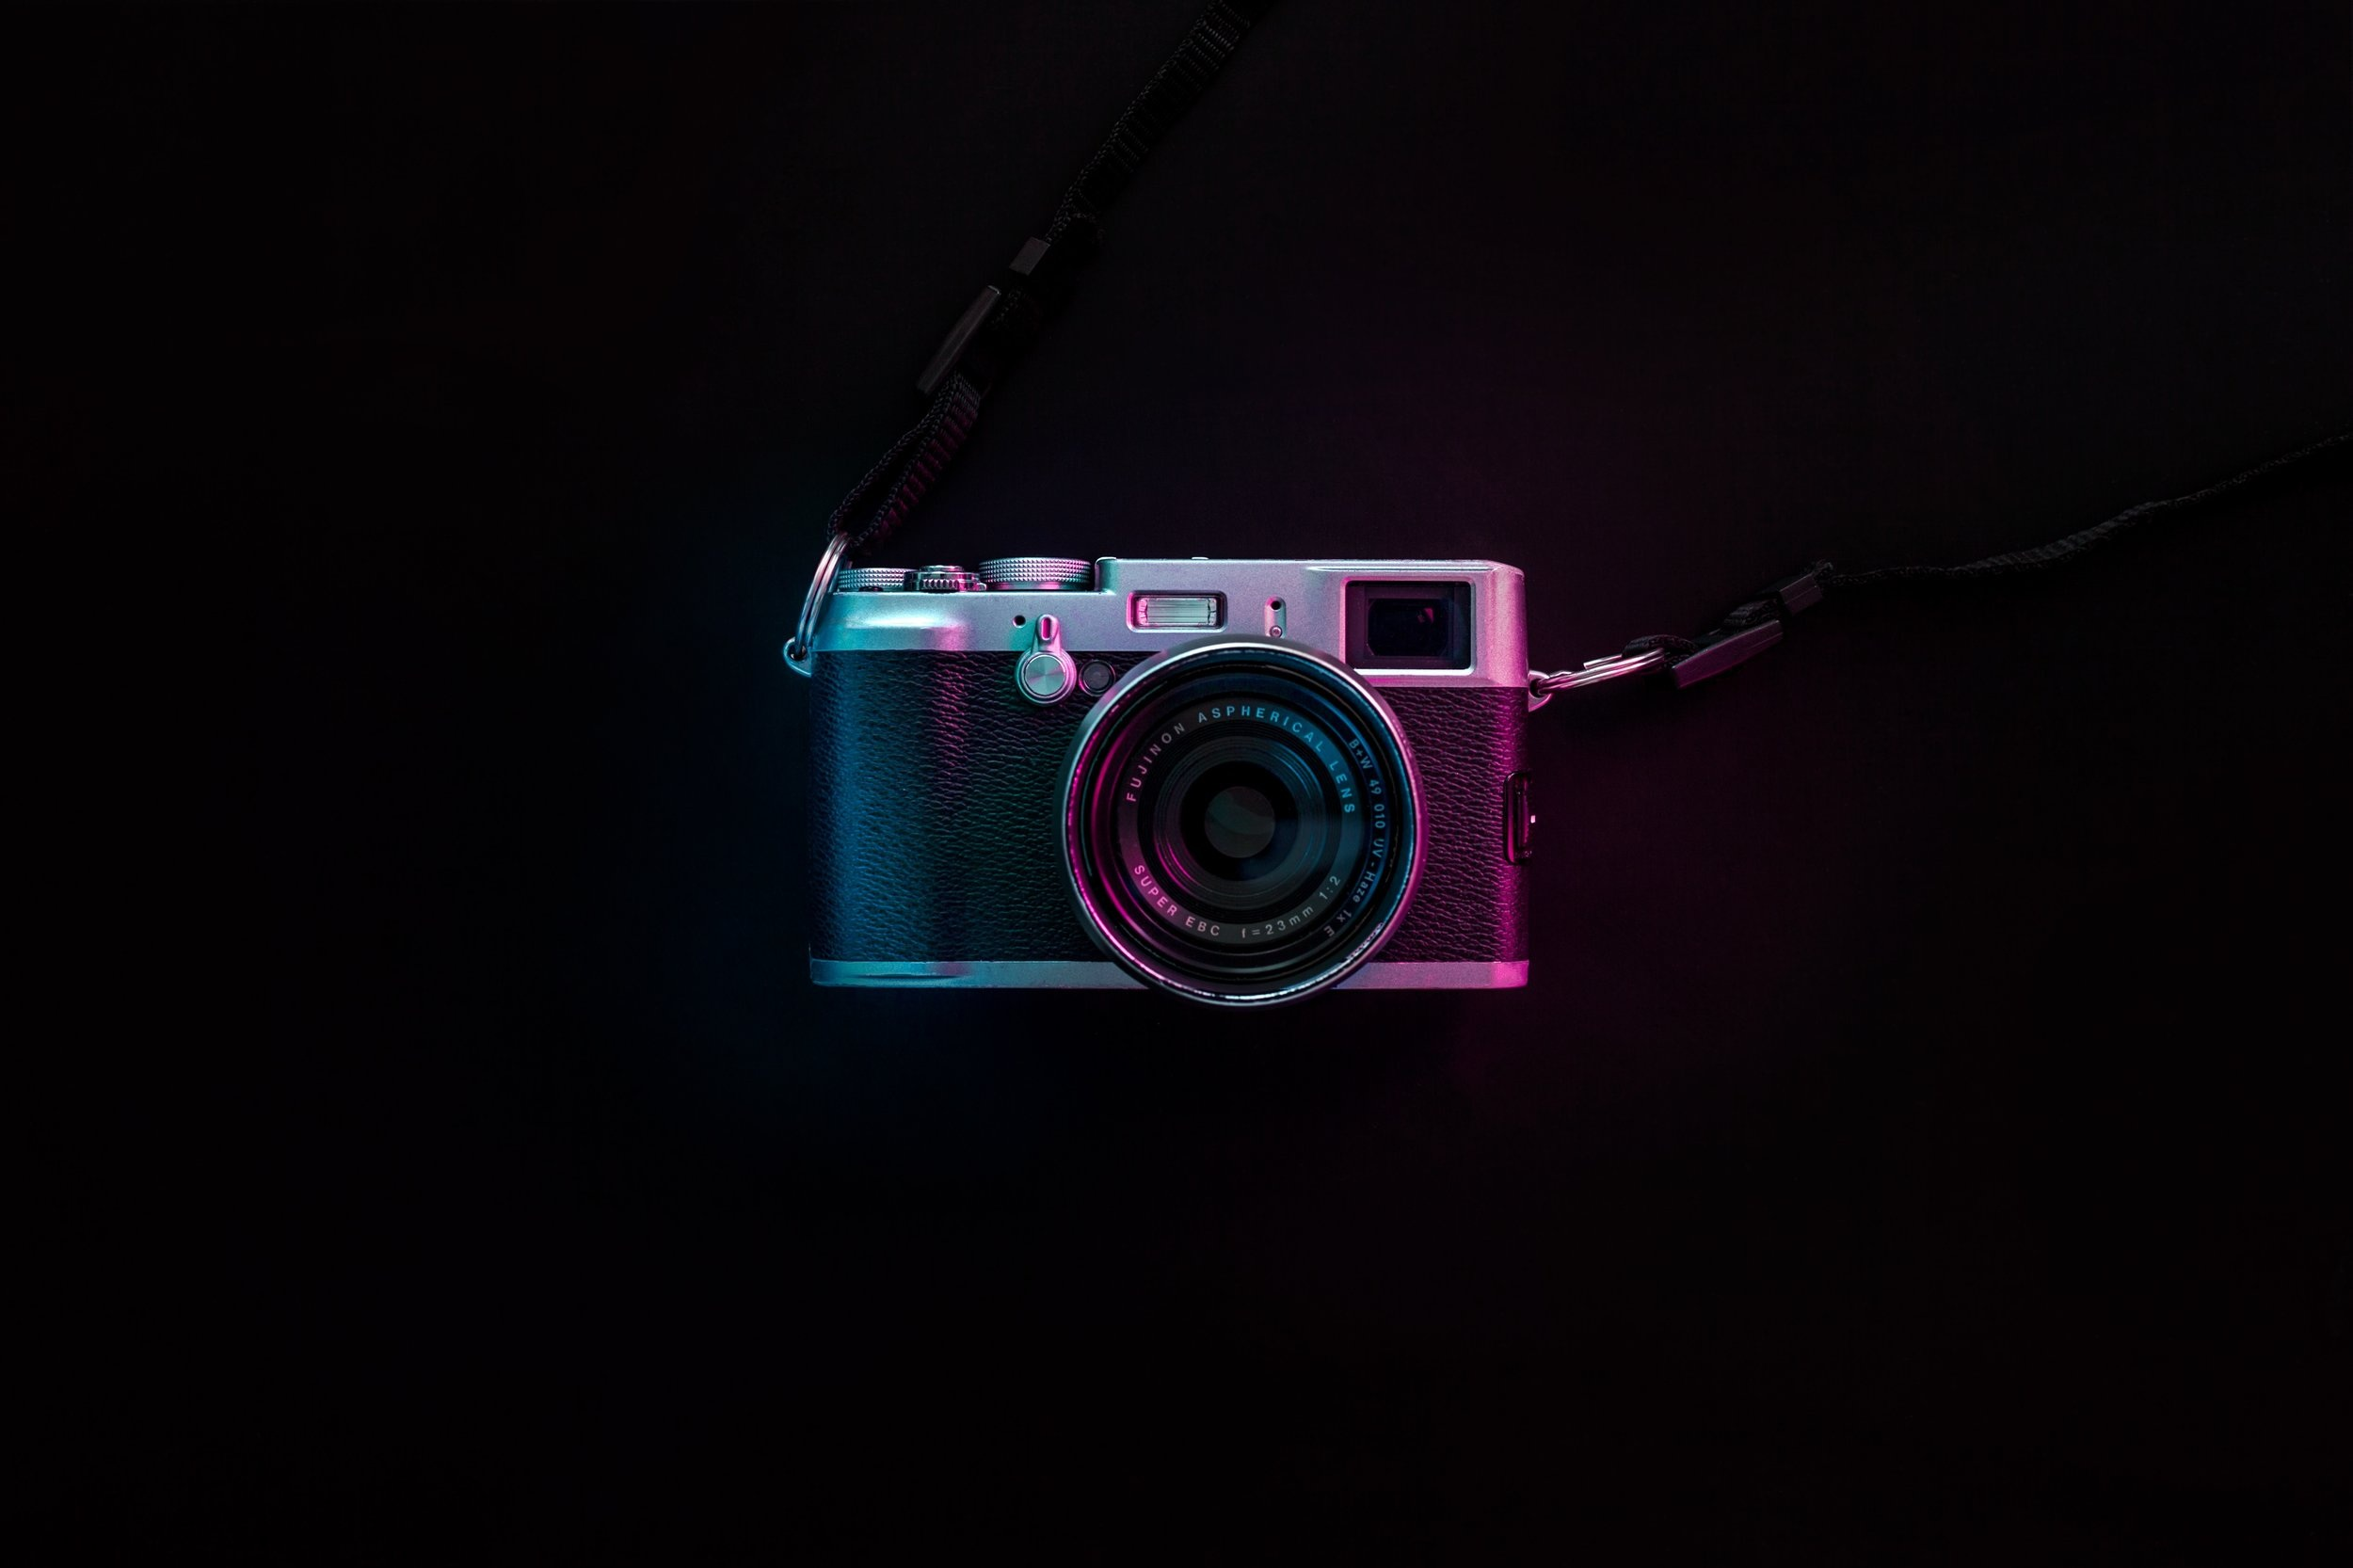 Photographic Equipment - Coming soon